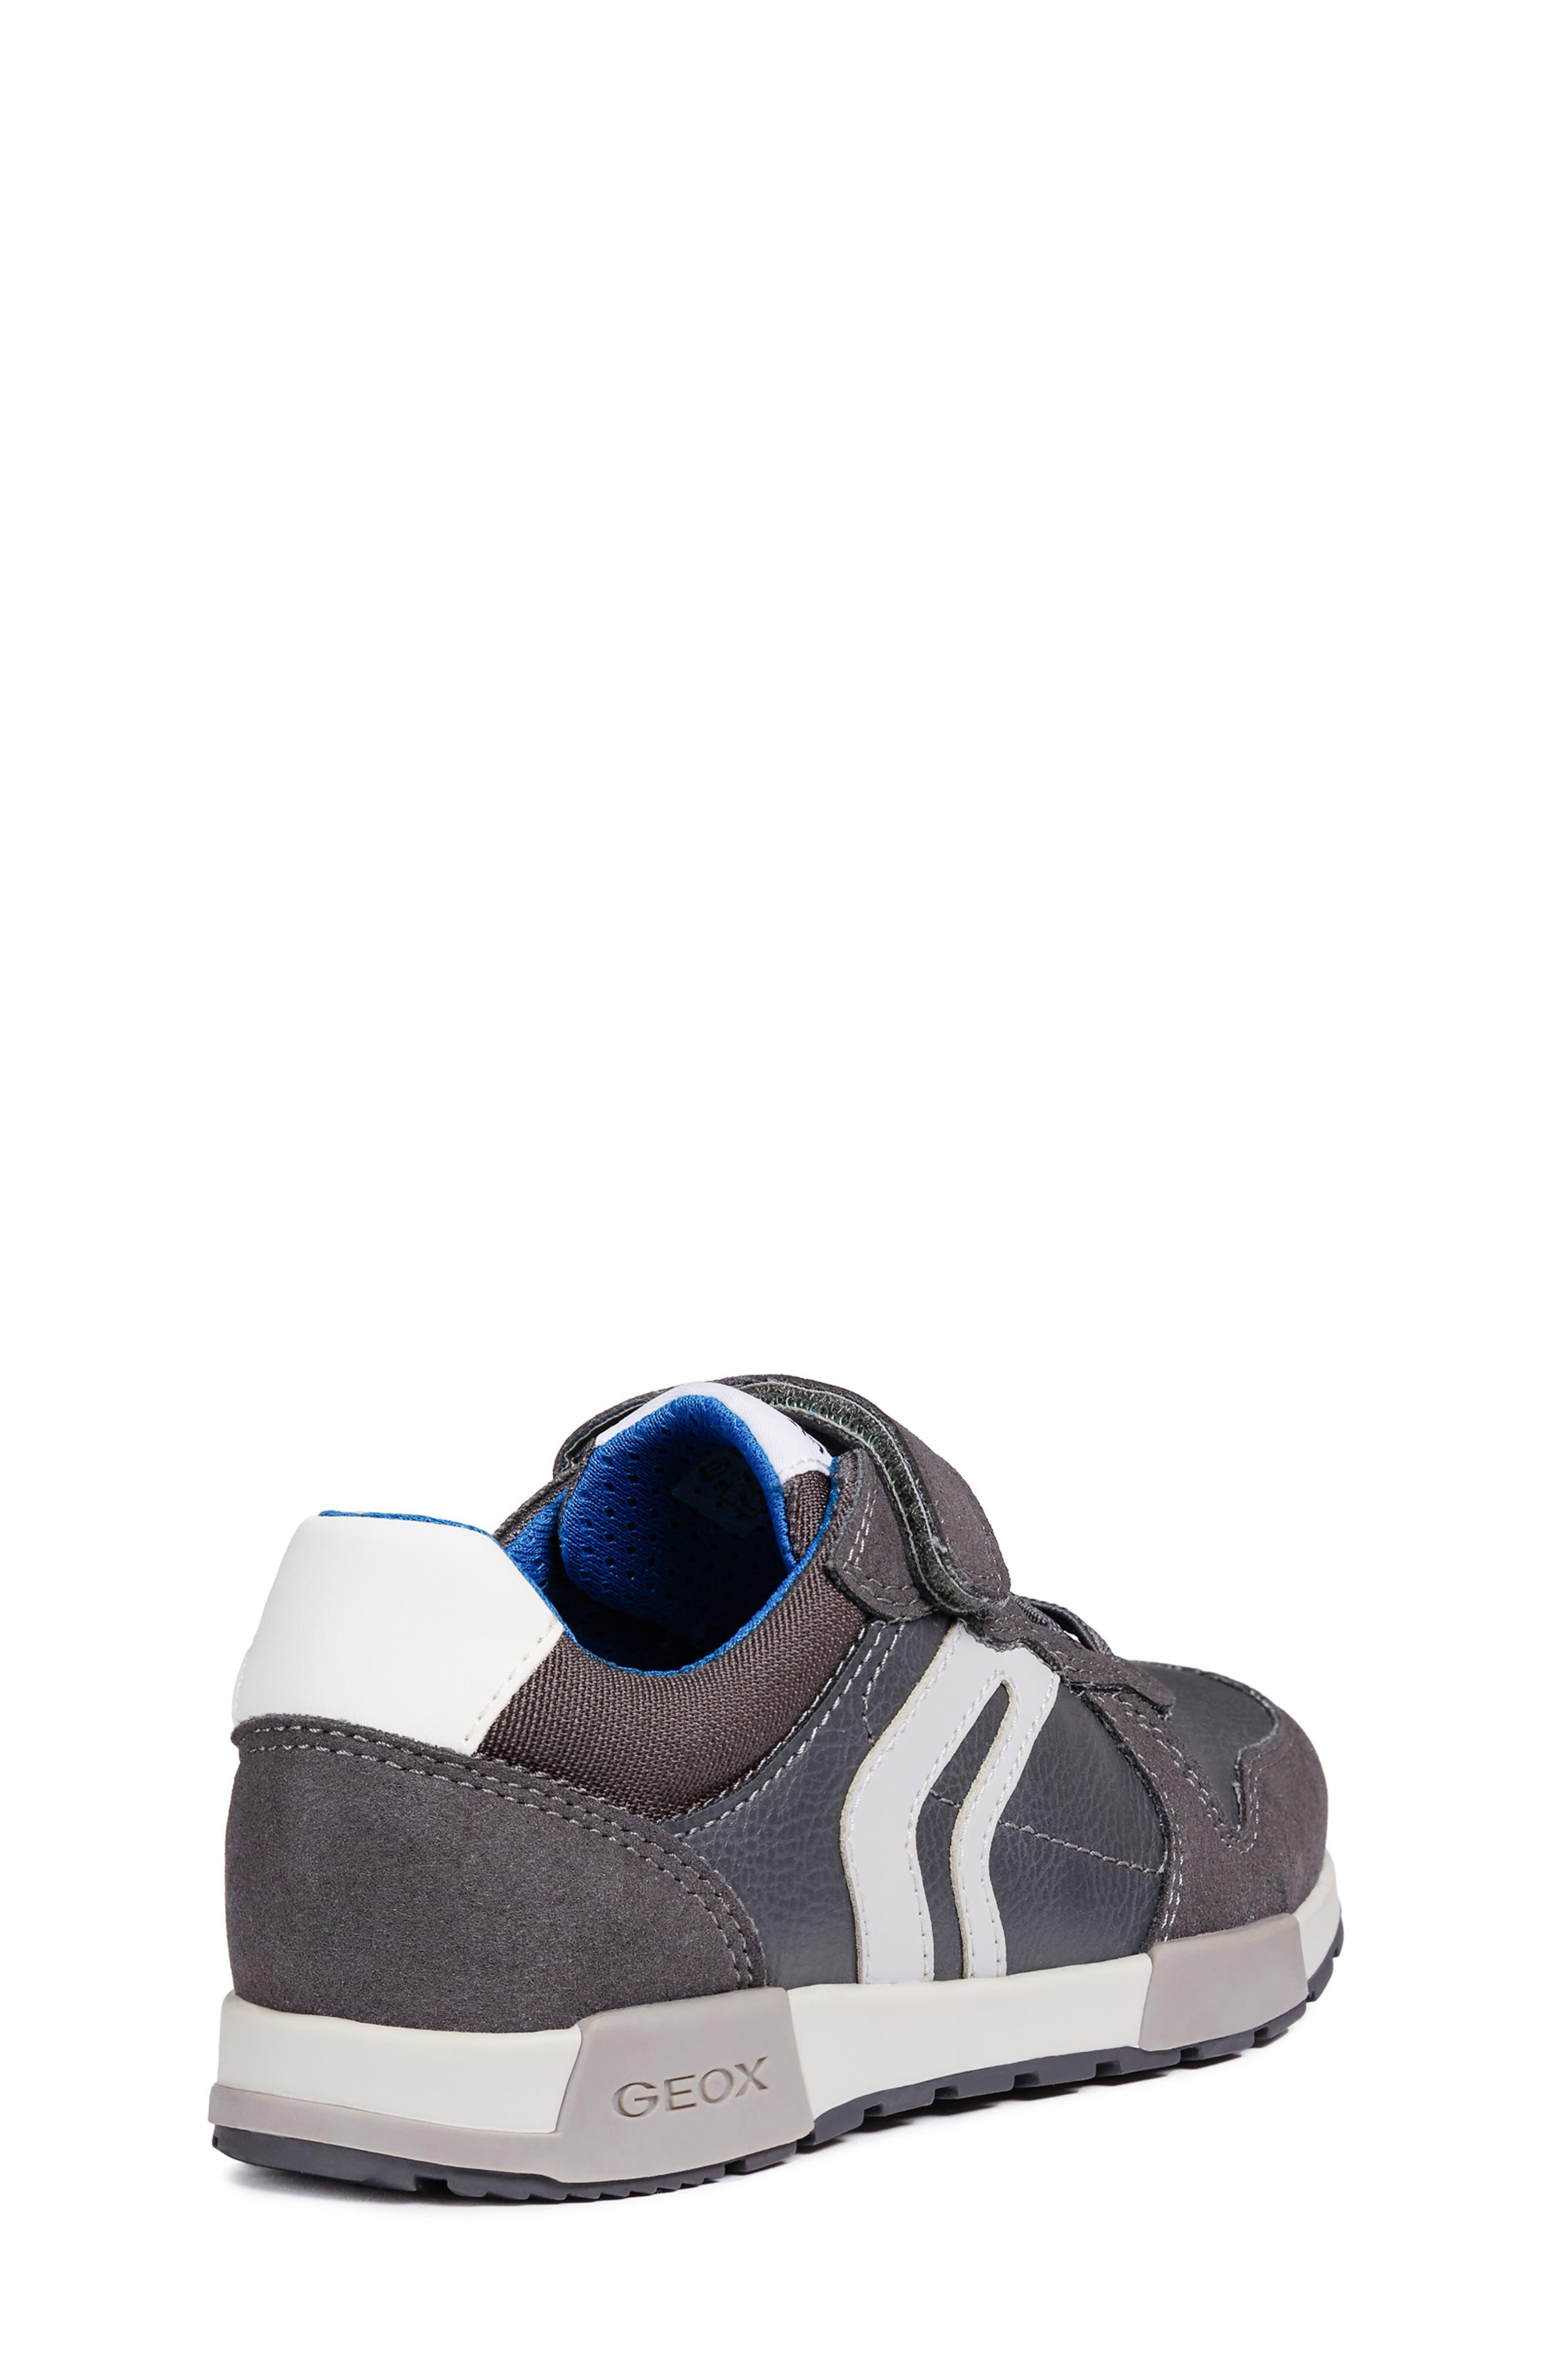 Alfier Boy Sneaker,                             Alternate thumbnail 6, color,                             DARK GREY/GREY